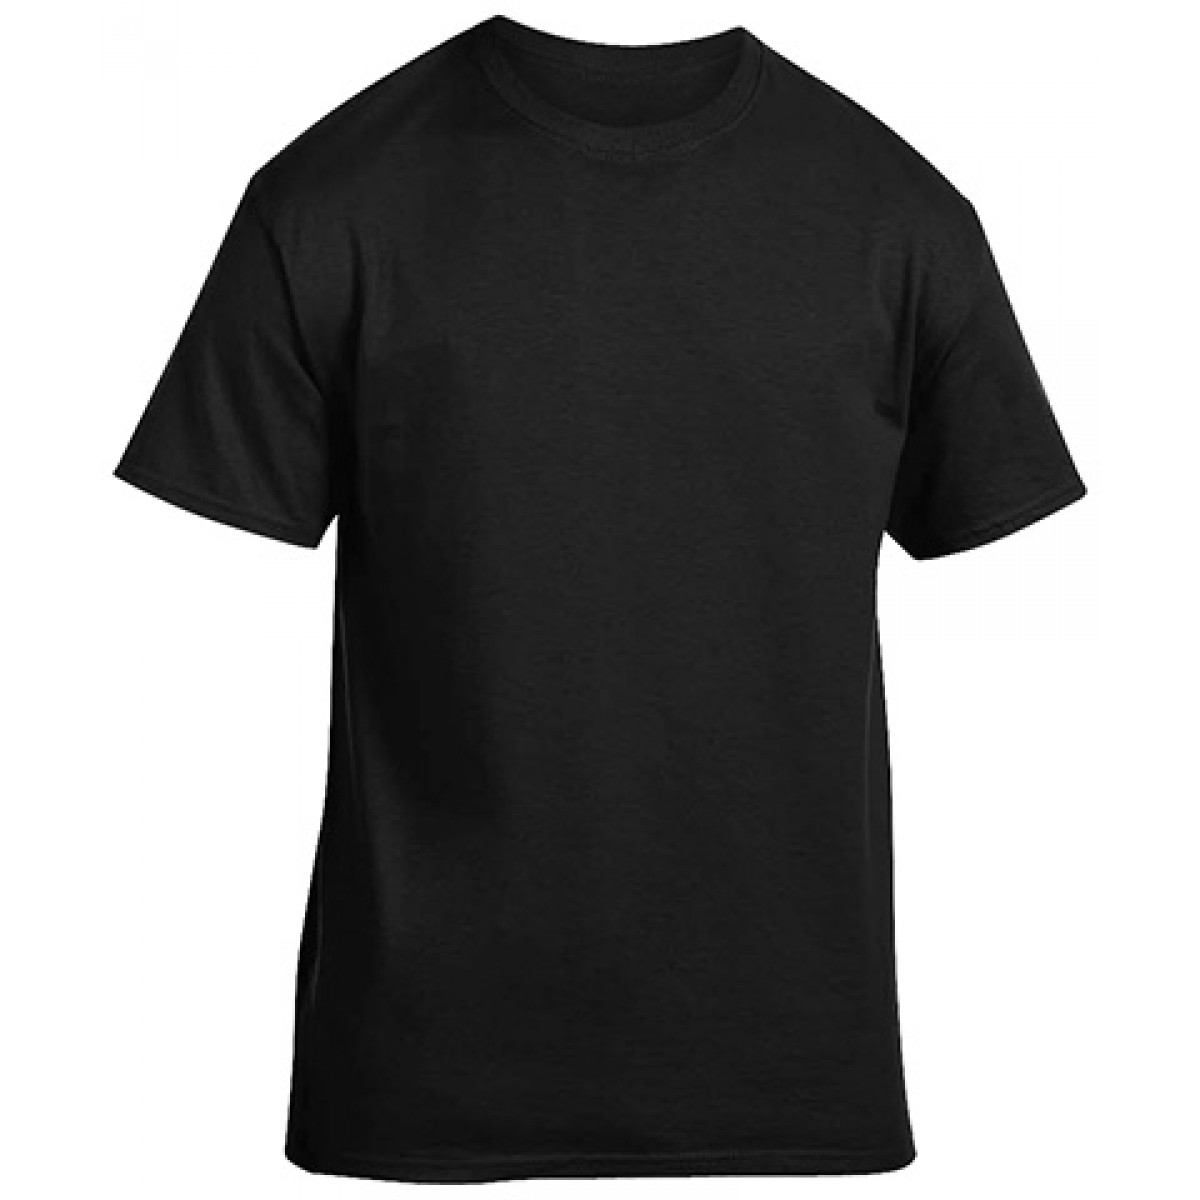 Cotton Short Sleeve T-Shirt-Black-2XL